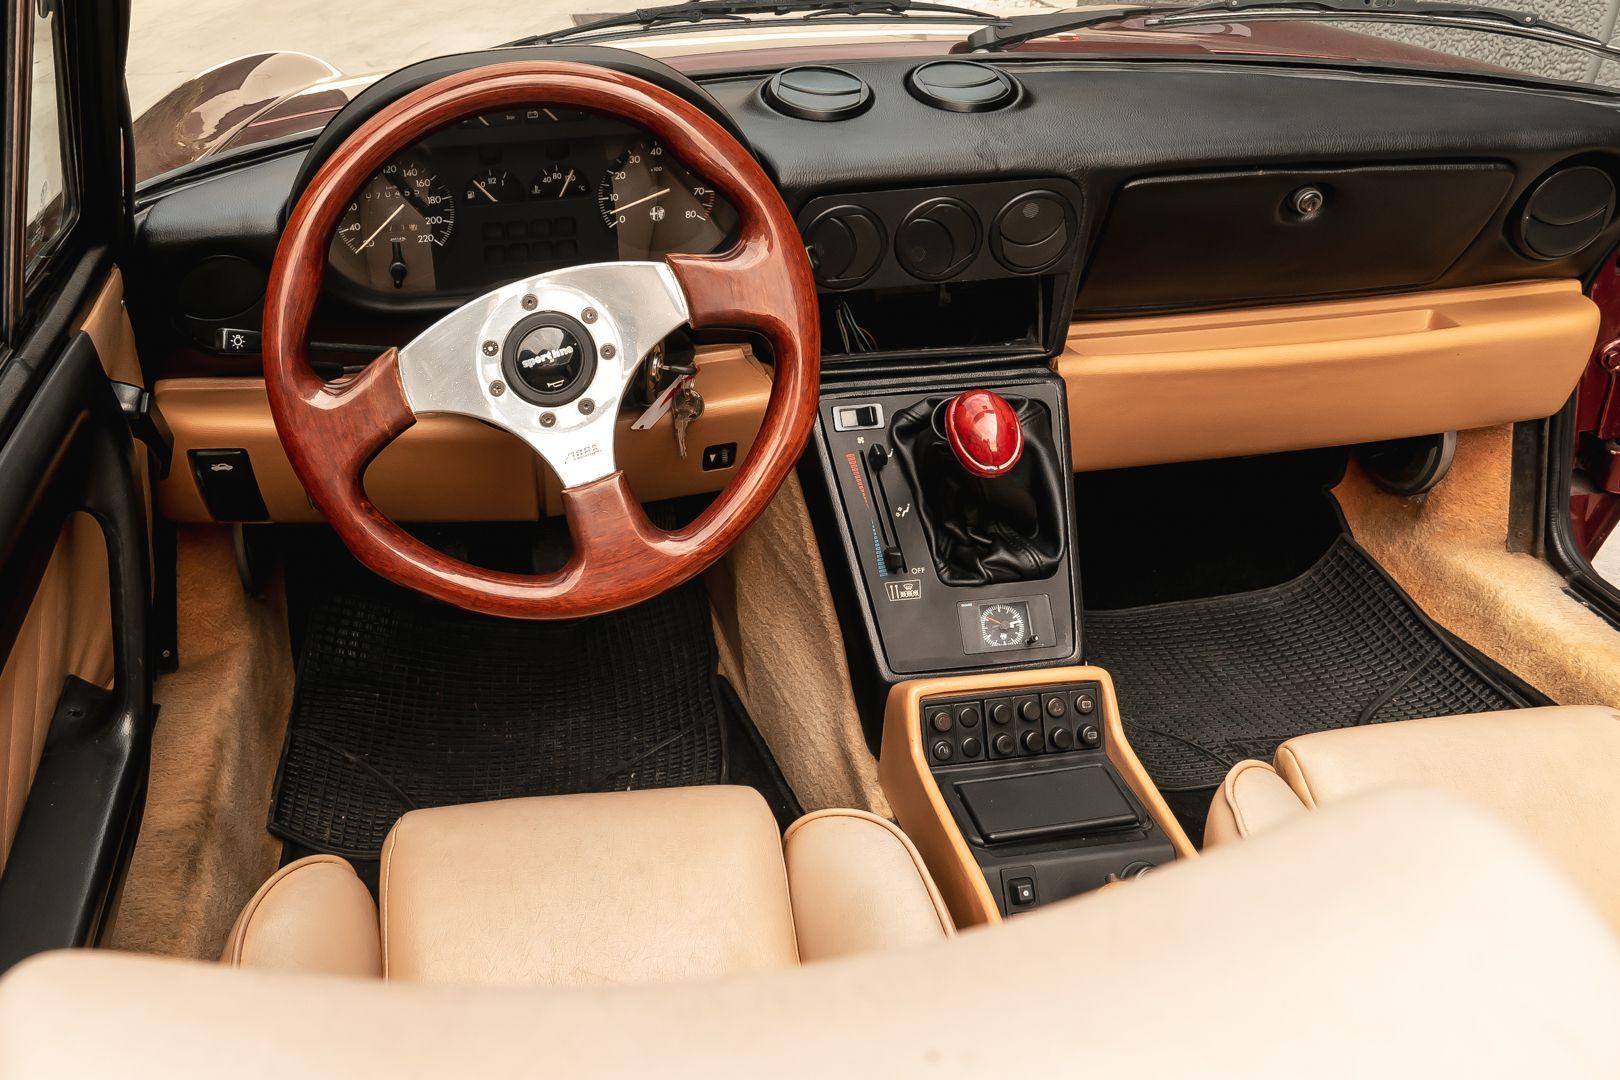 1990 Alfa Romeo Duetto 2000 IV Serie 79783